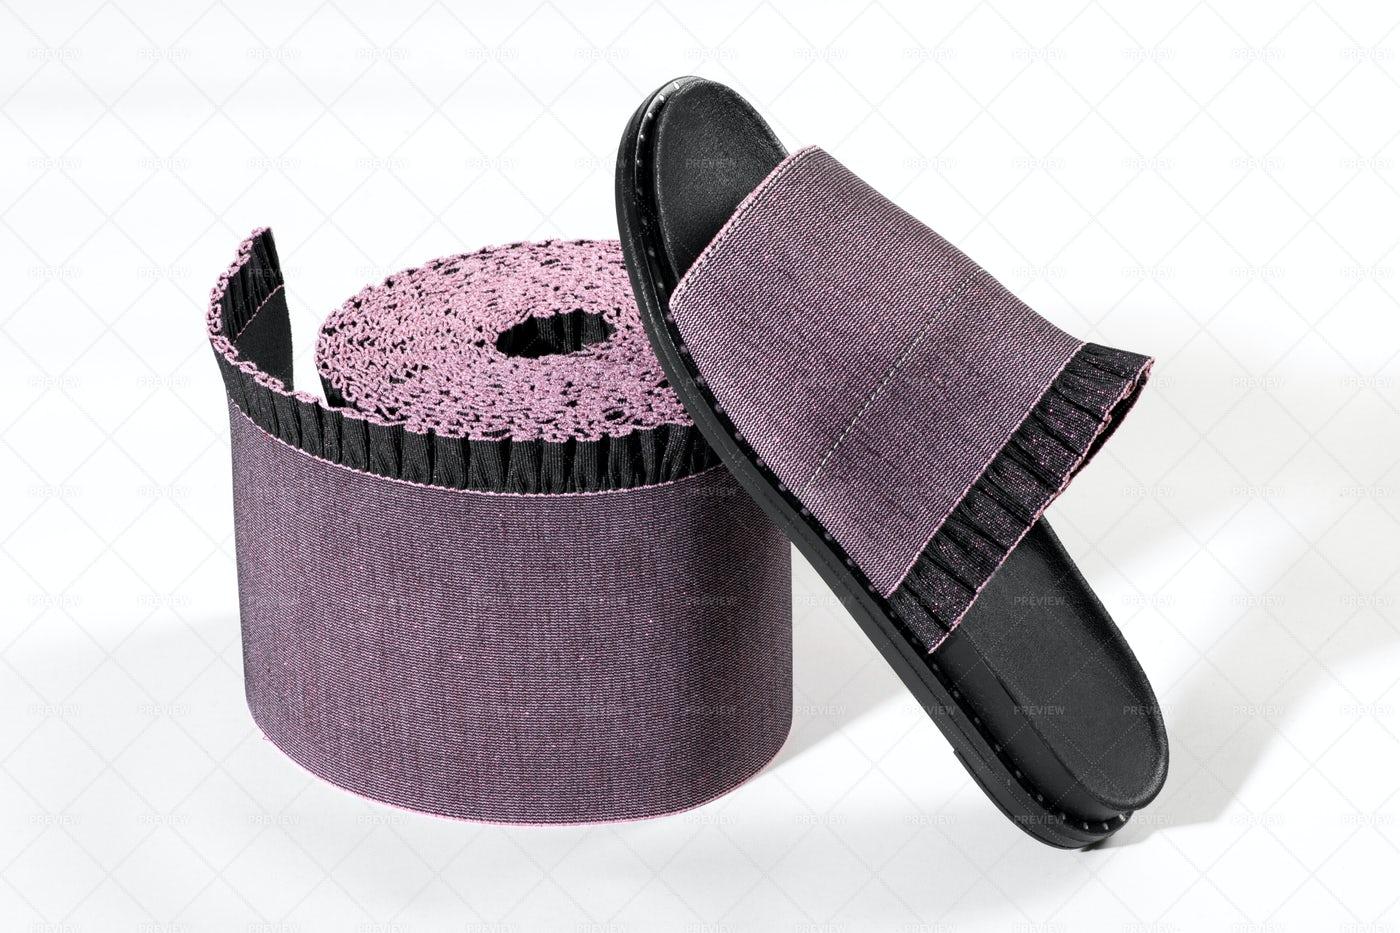 Elastic Ribbon And Sandal: Stock Photos